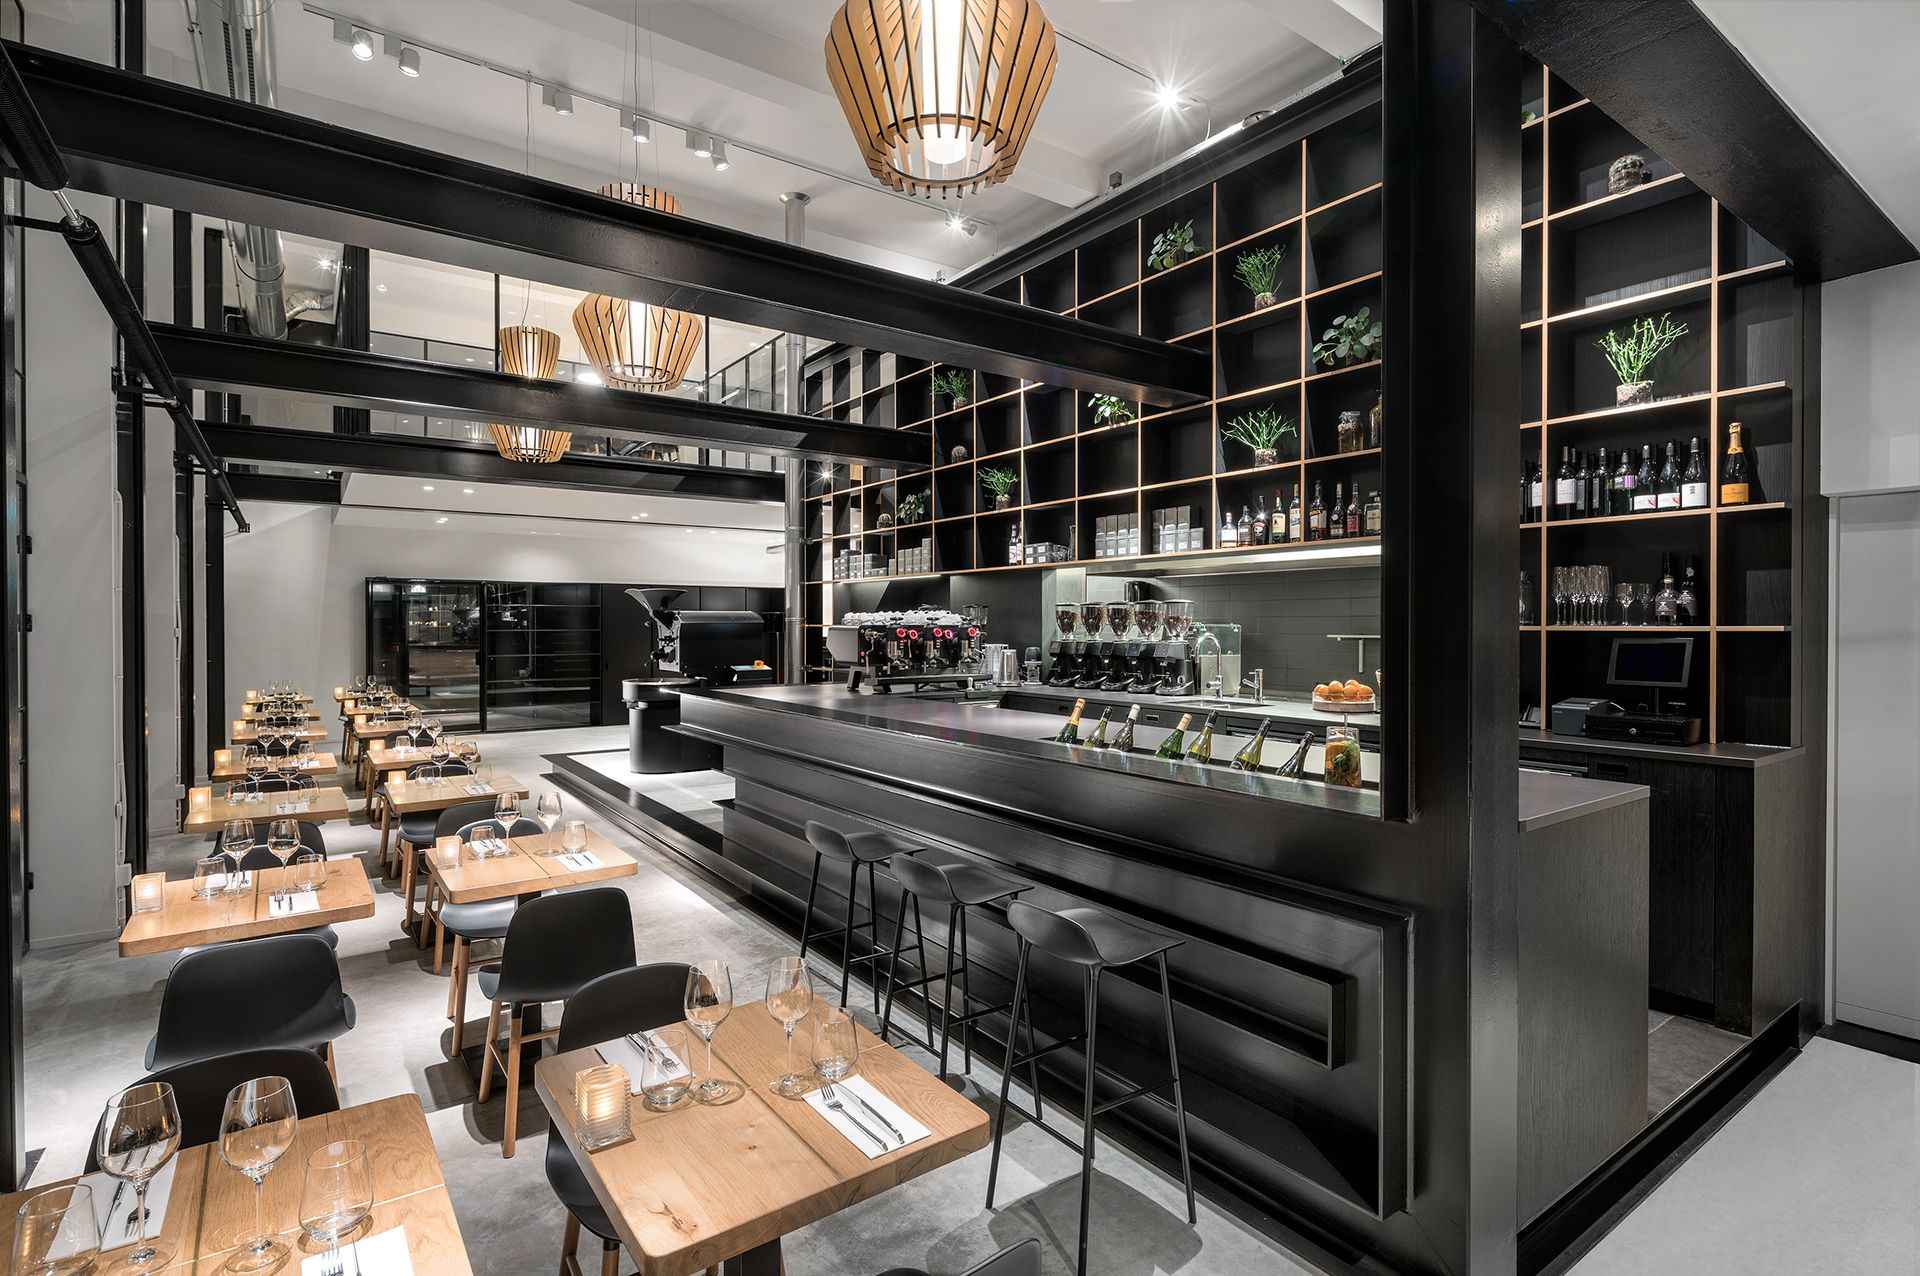 Idee Per Interni Bar : Come arredare un bar idee e consigli di esperti maculan arredo bar